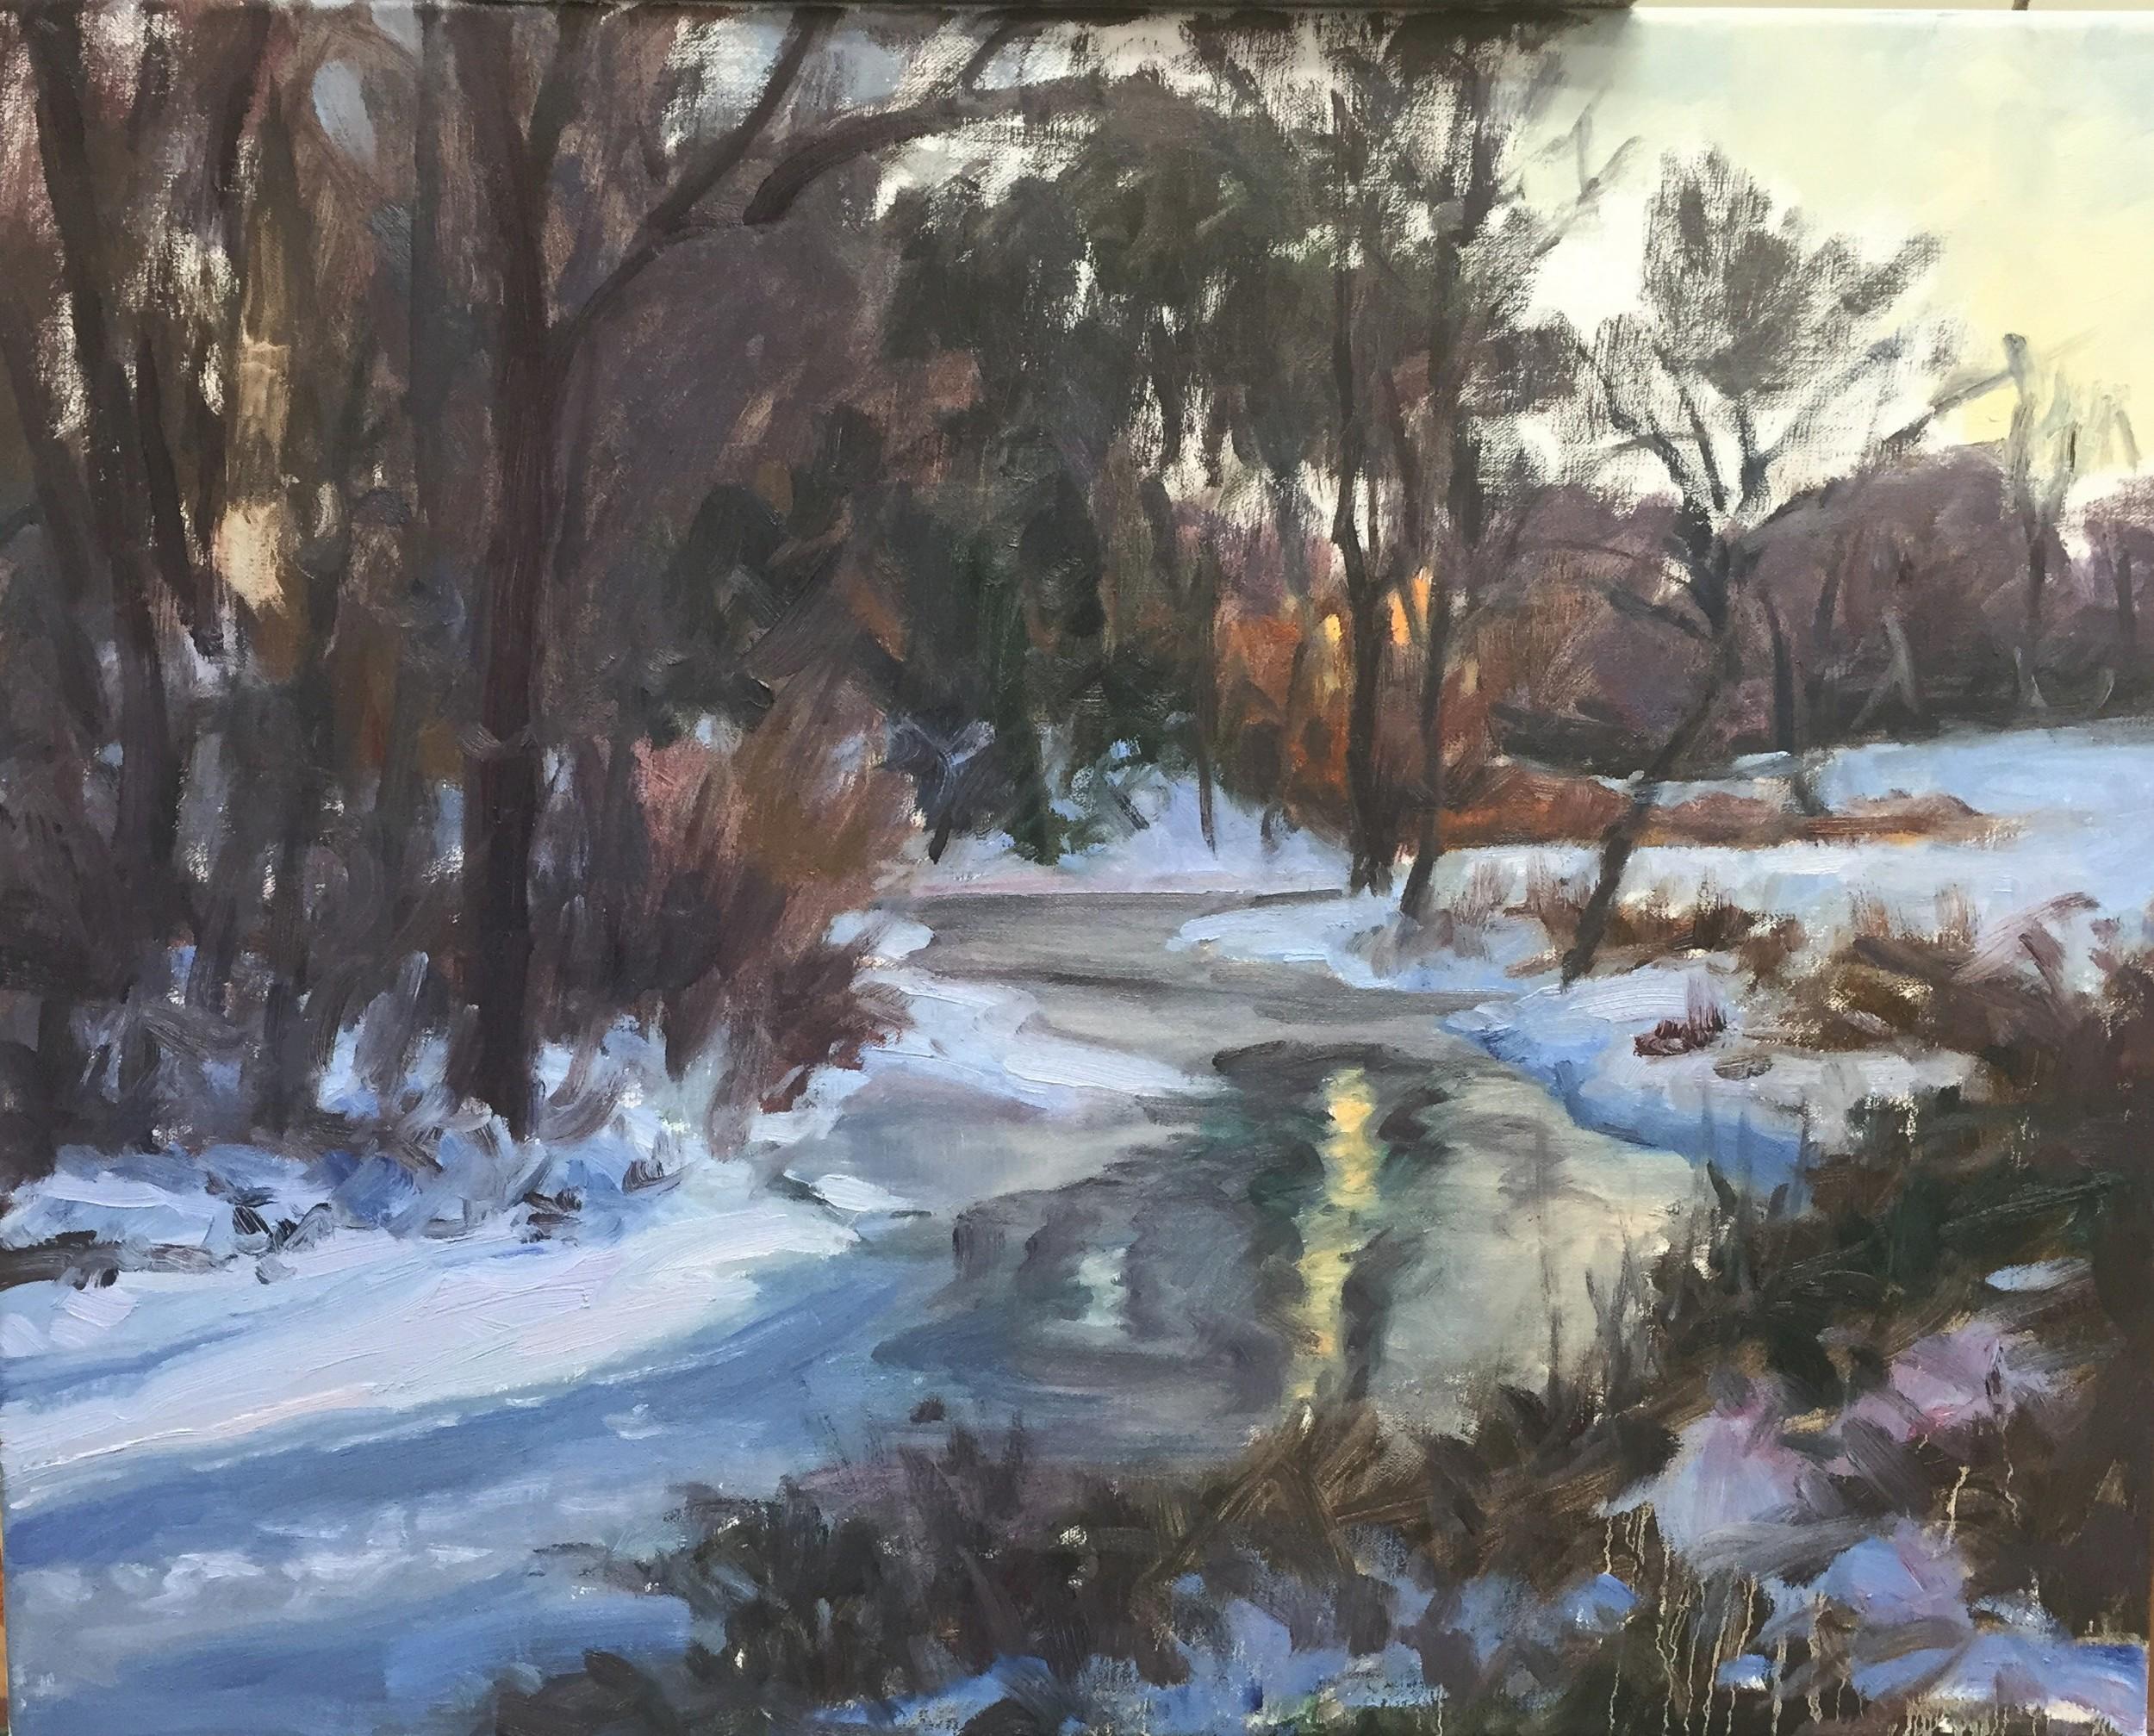 Winter landscape painting in progress by Jennifer E Young